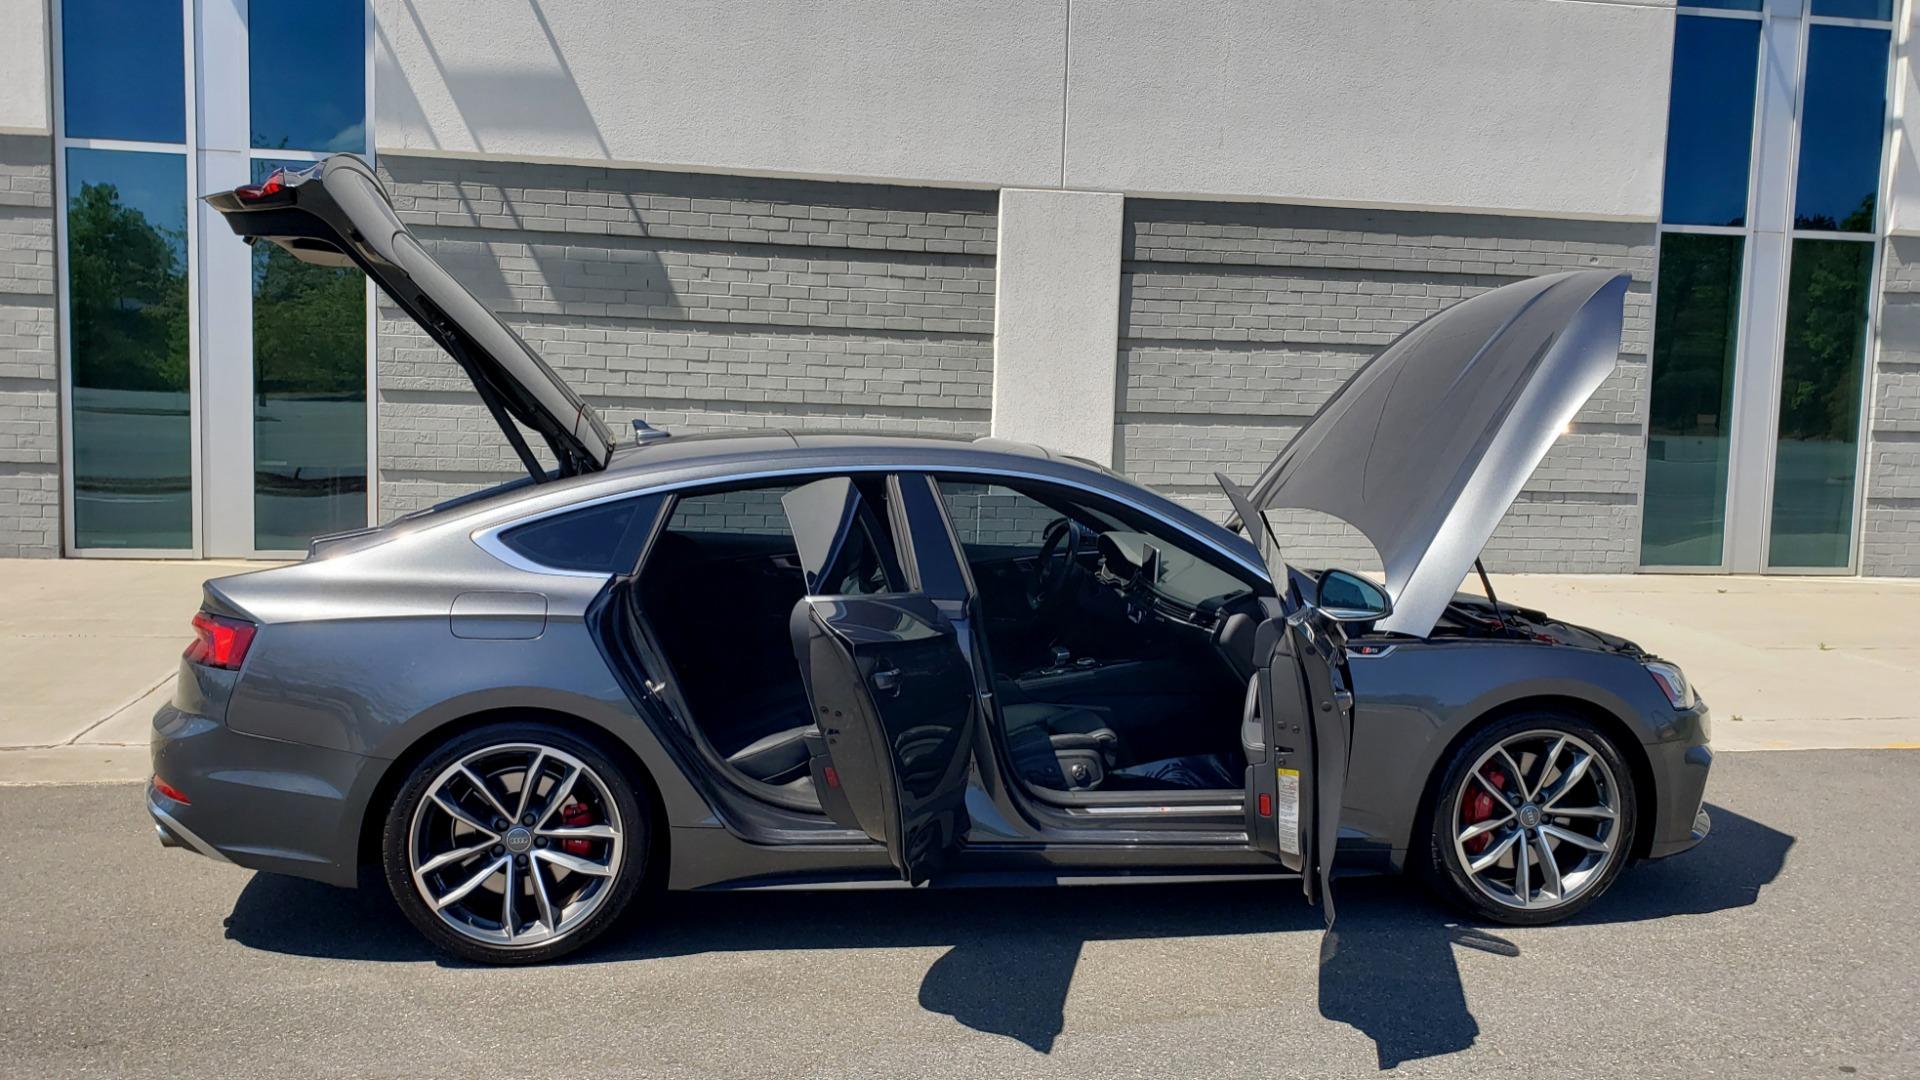 Used 2018 Audi S5 SPORTBACK PRESTIGE S-SPORT / NAV / SUNROOF / HUD / B&O SND / REARVIEW for sale $48,995 at Formula Imports in Charlotte NC 28227 13